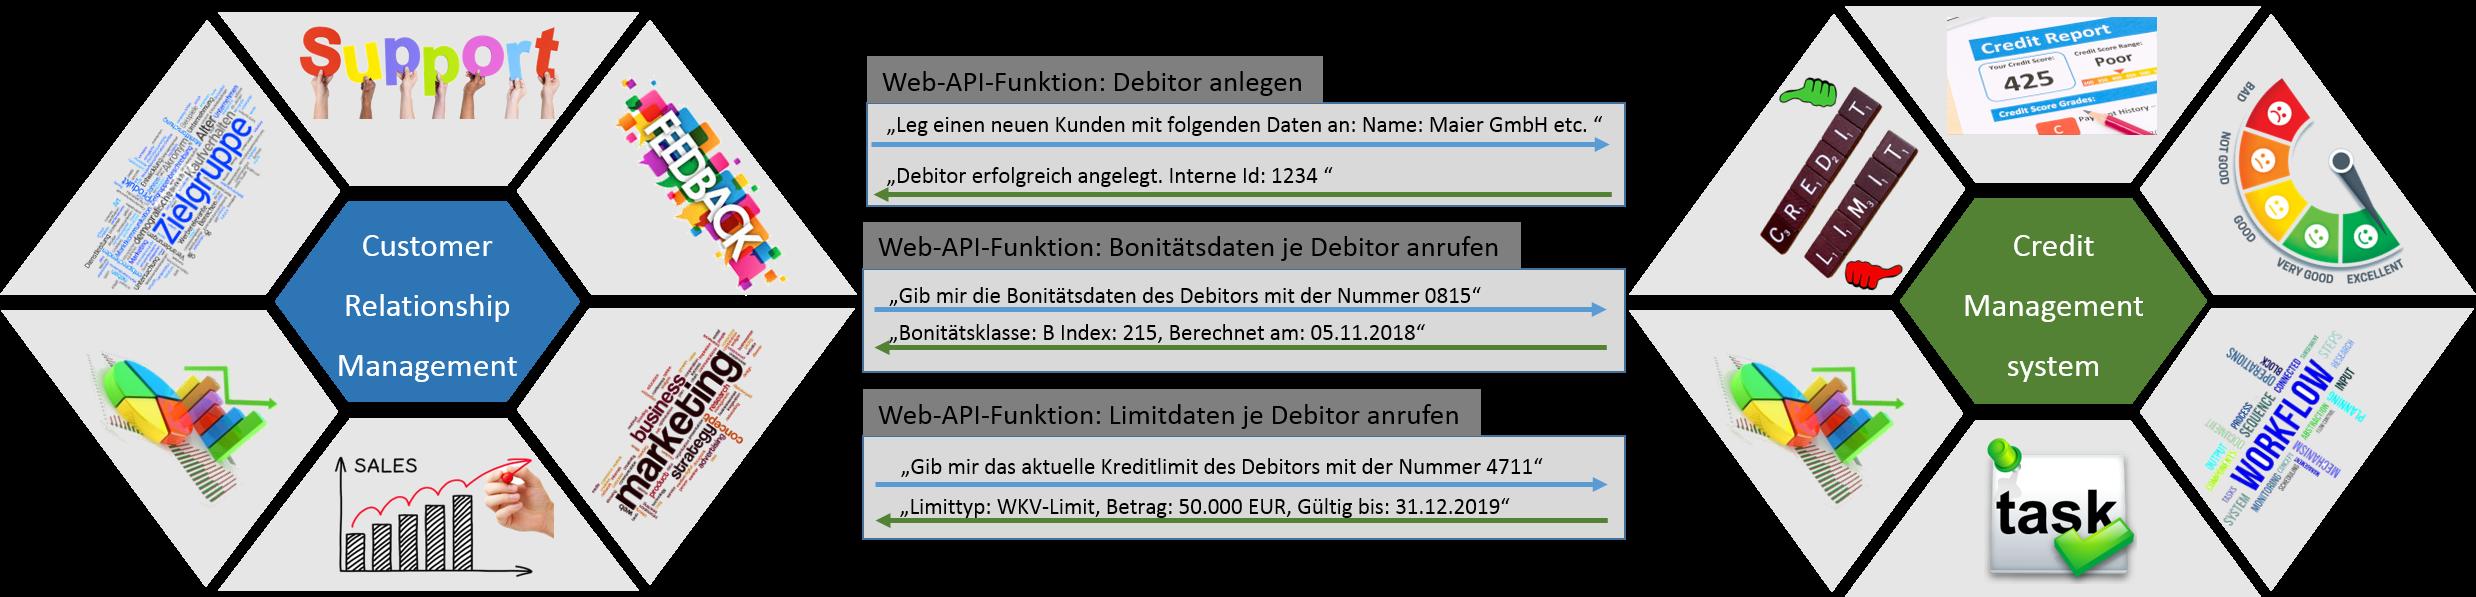 CRM_CMS_Kommunikation_Webservice